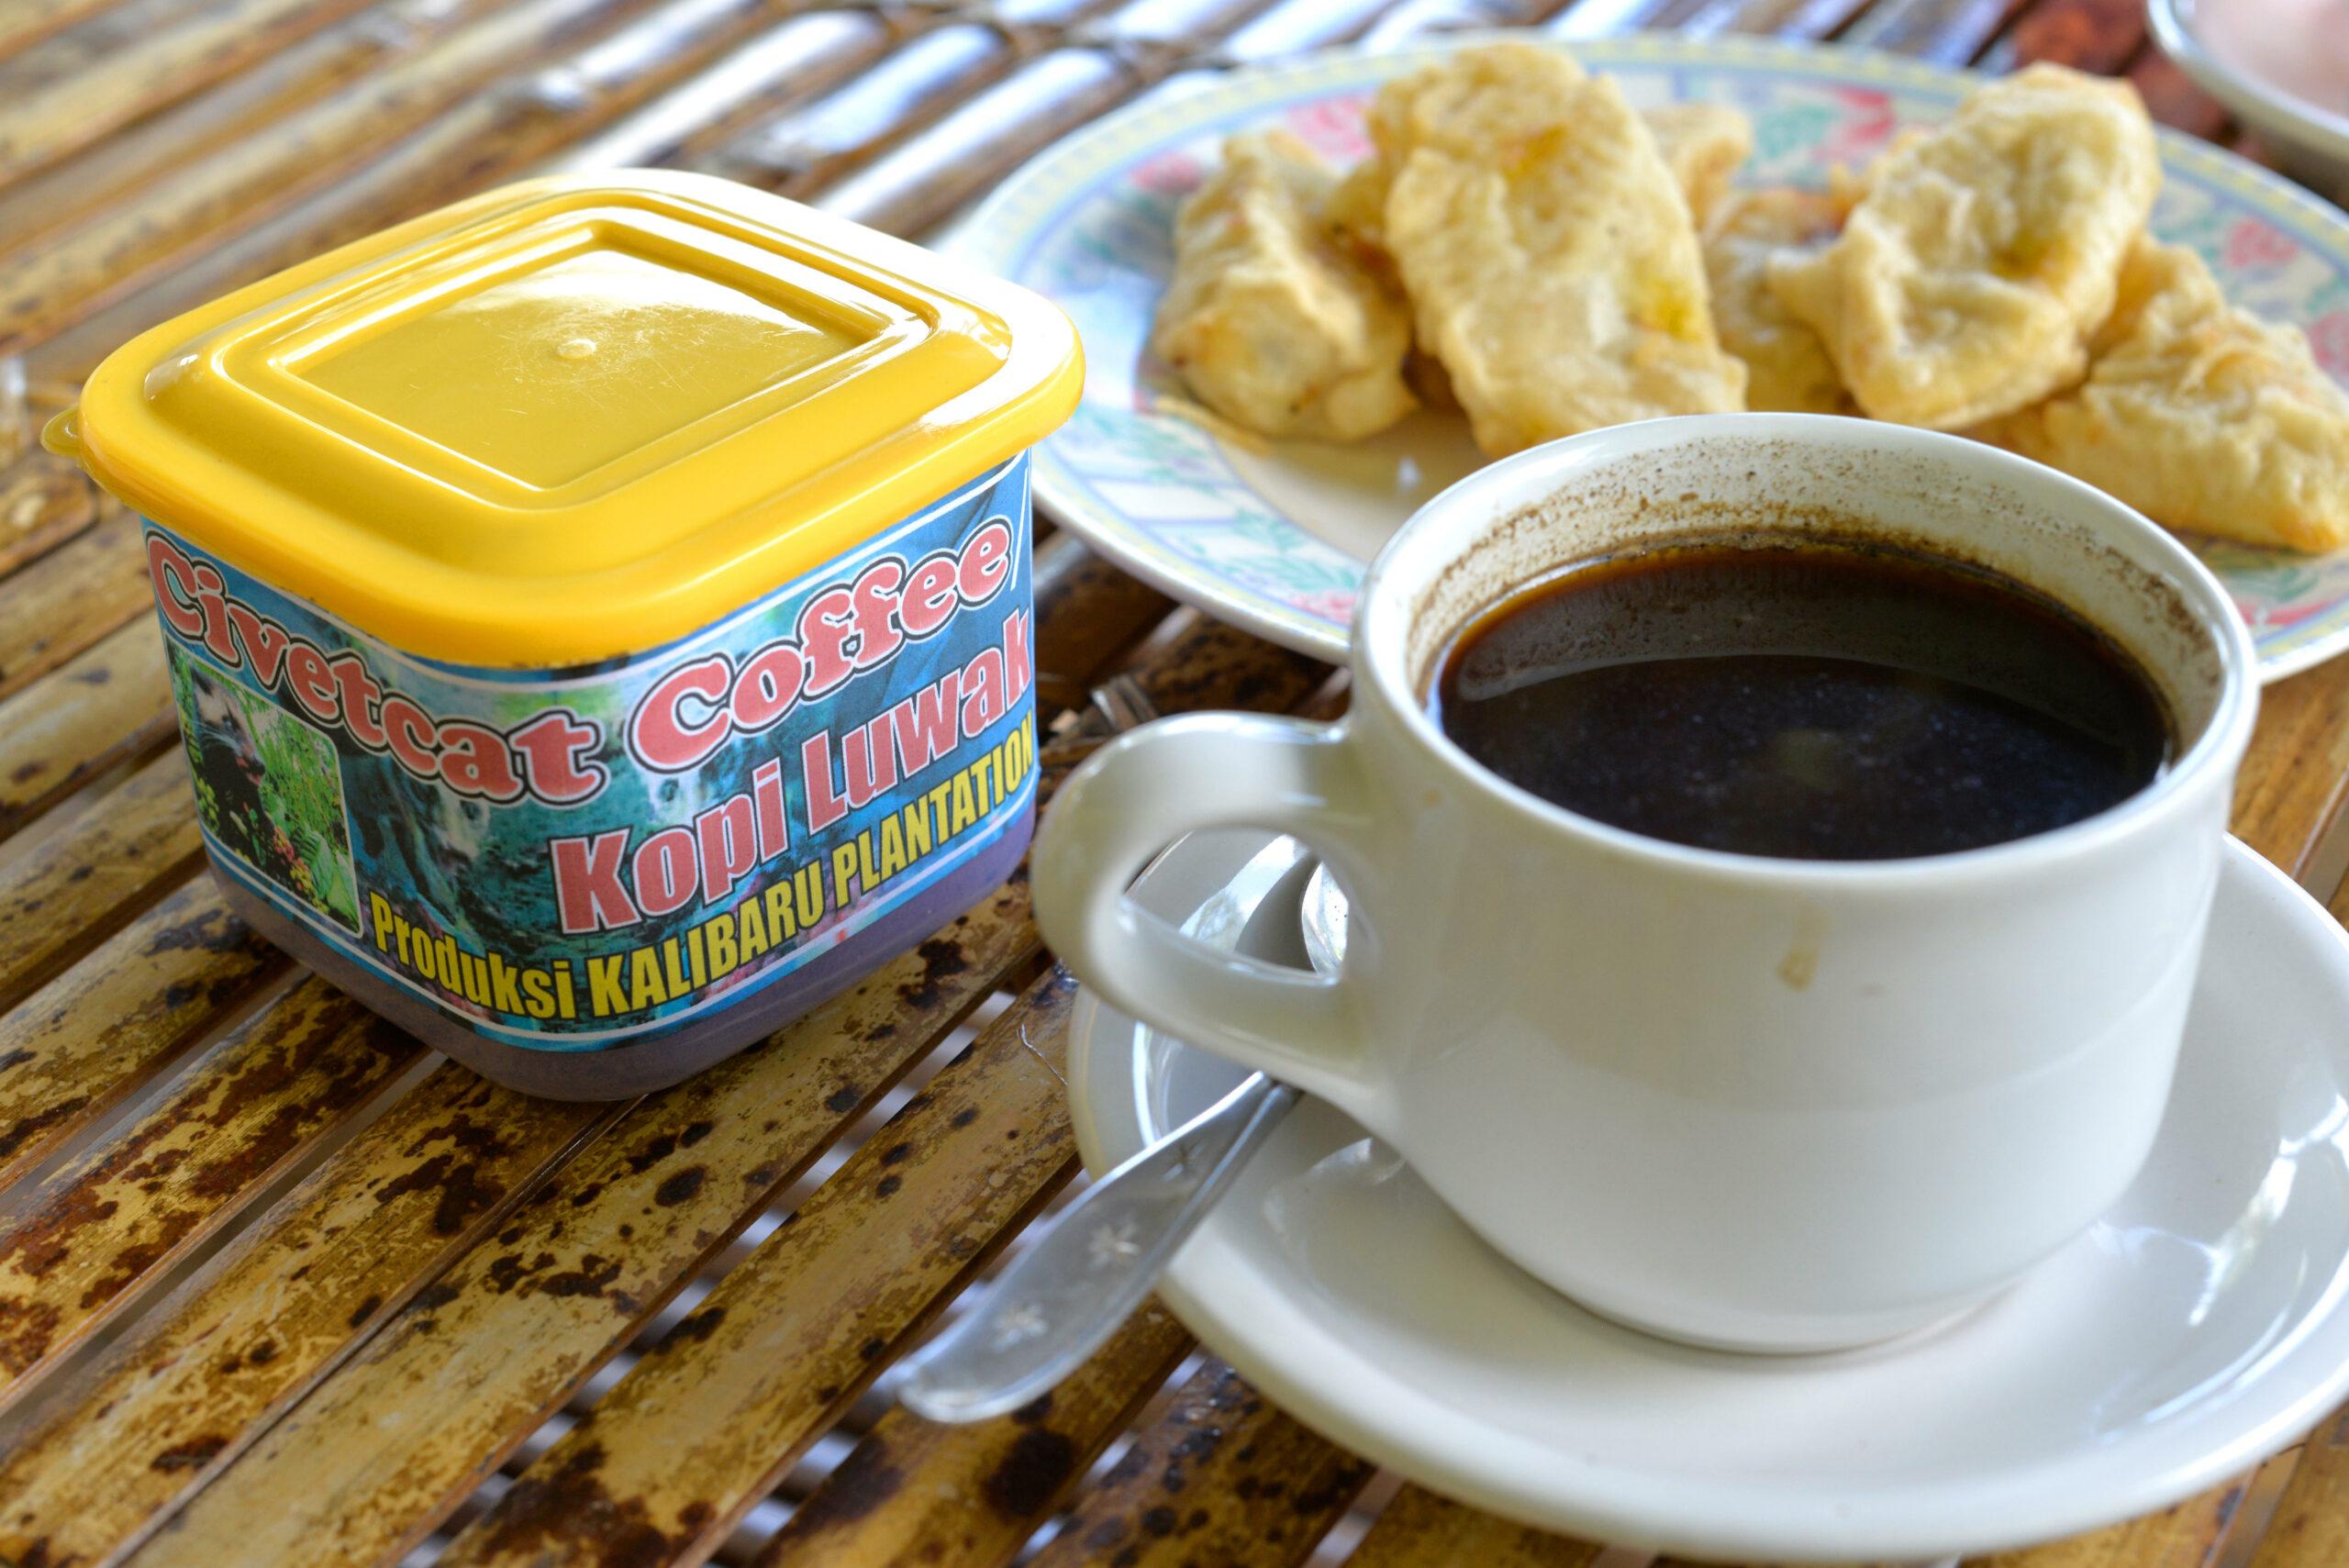 Kopi Luwak best non-alcoholic drinks